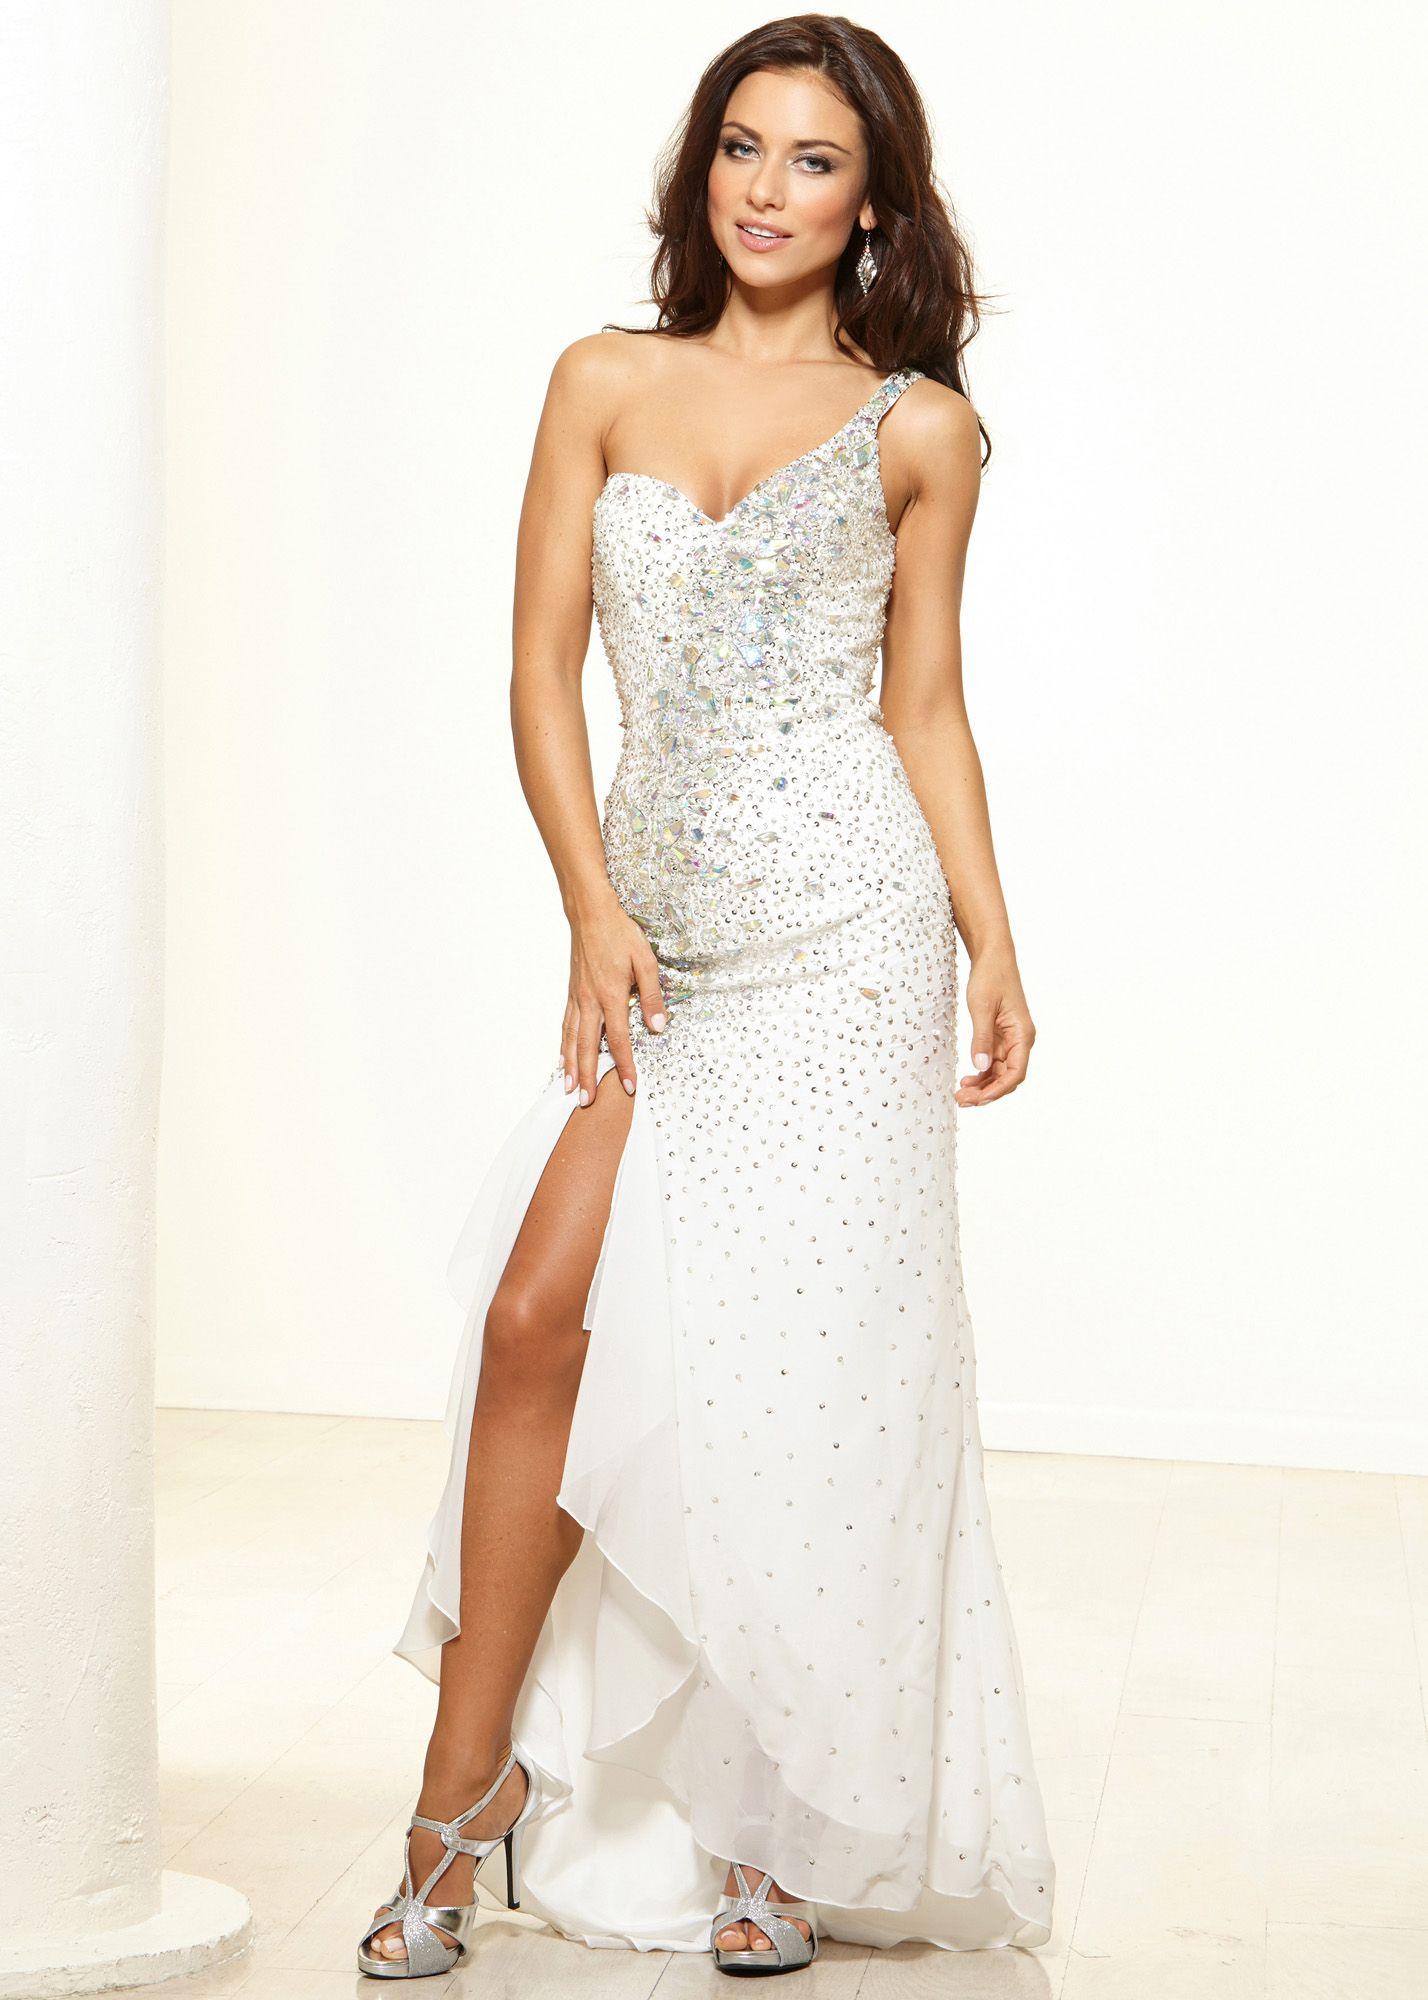 Terani Couture P2594 | Mermaid evening dresses, Mermaid